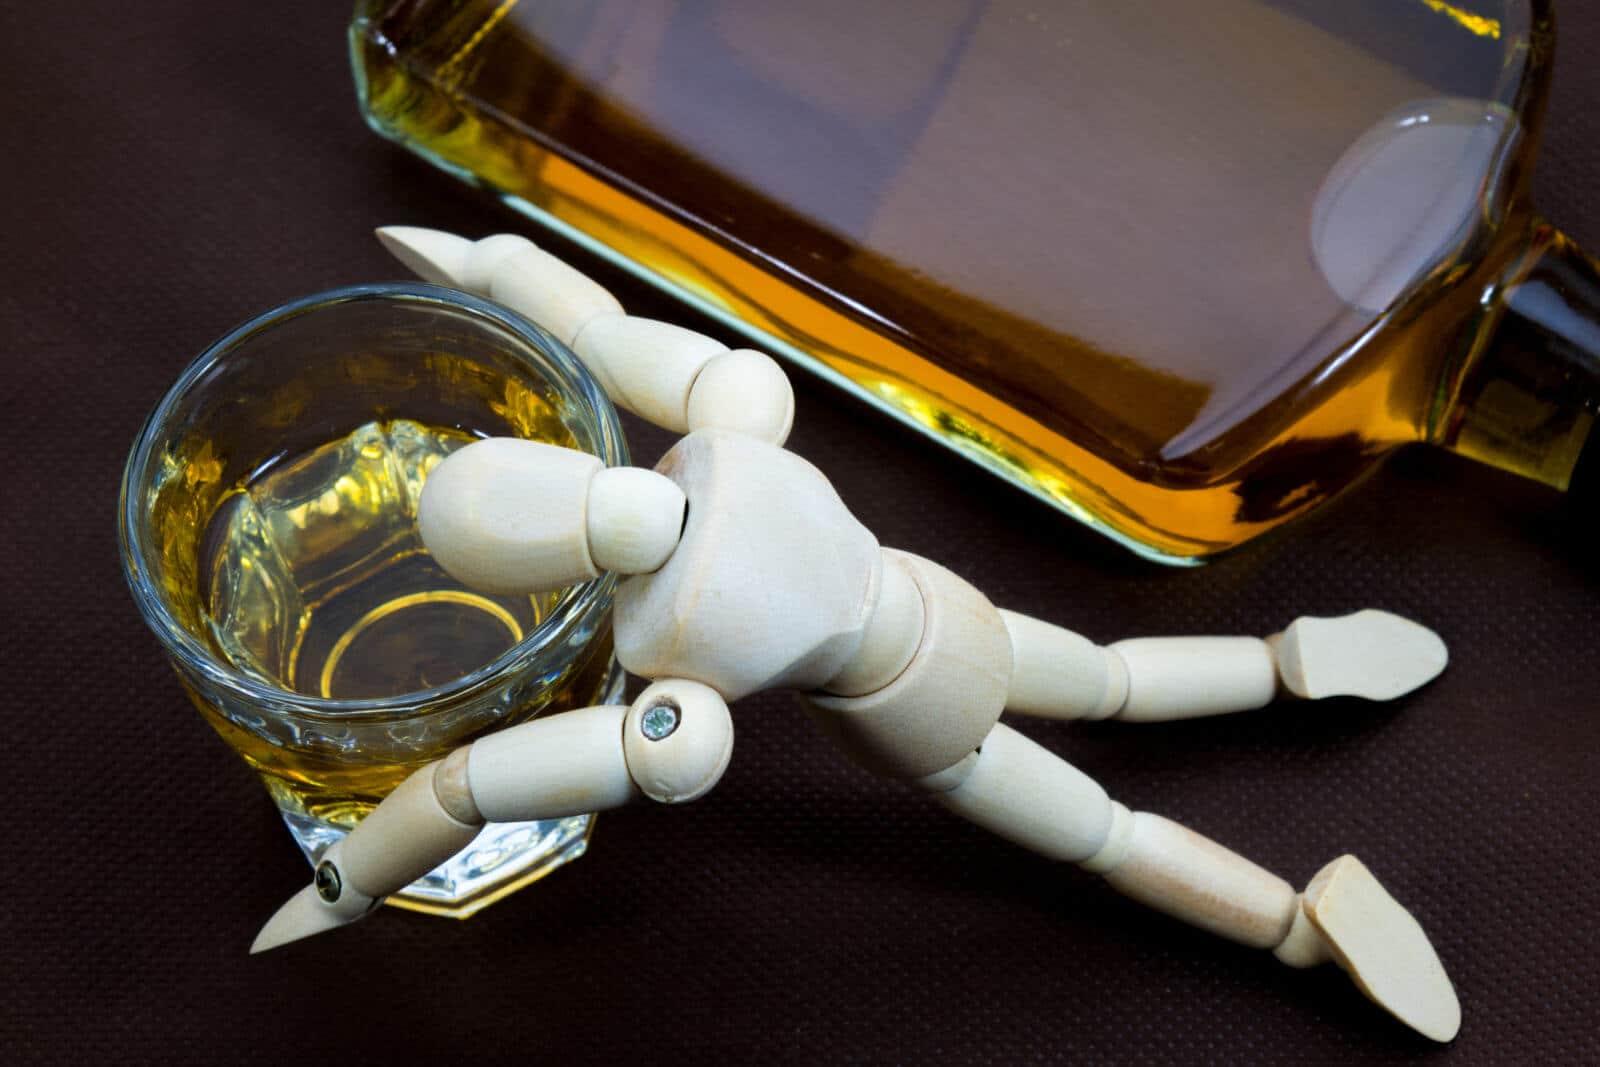 Thumbnail of Alcohol Poisoning